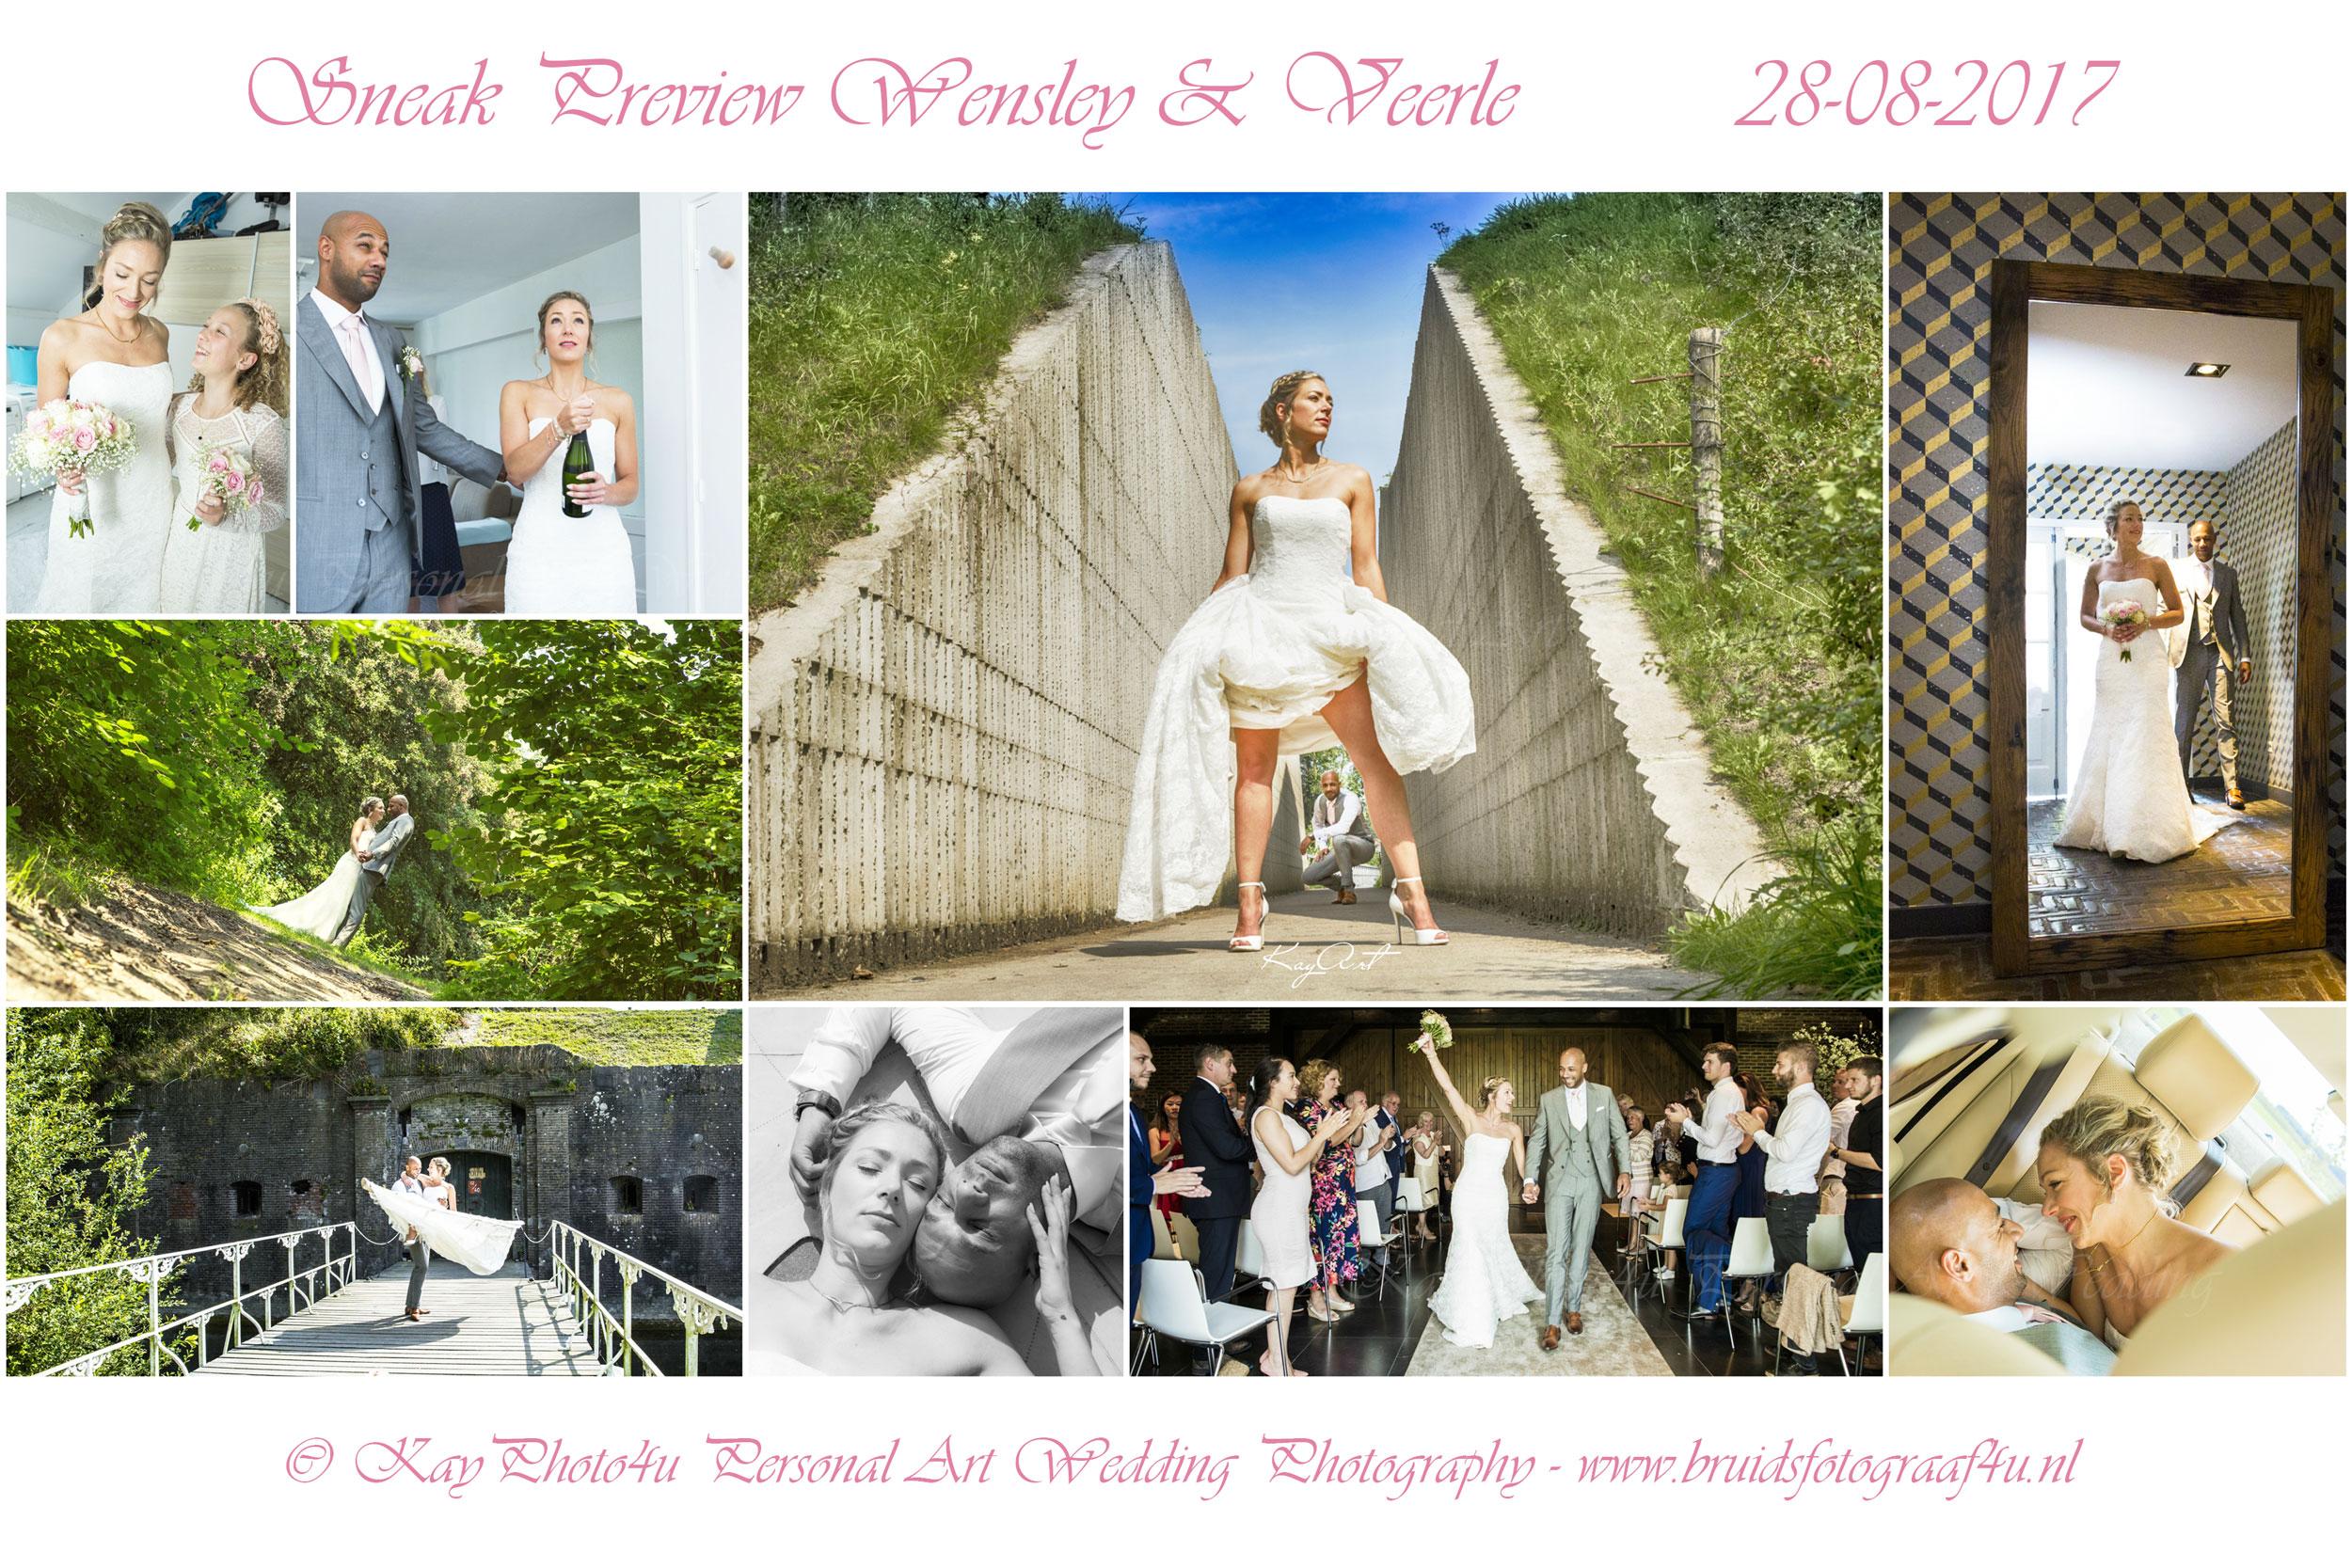 bruidsfotograaf4u, kayphoto4u, trouwfotograaf, bruidsfotograaf, bruidsfotograaf, huwelijksfotograaf, Trouwen, bruidsreportage, bruidsreportage, fotoshoot huwelijk